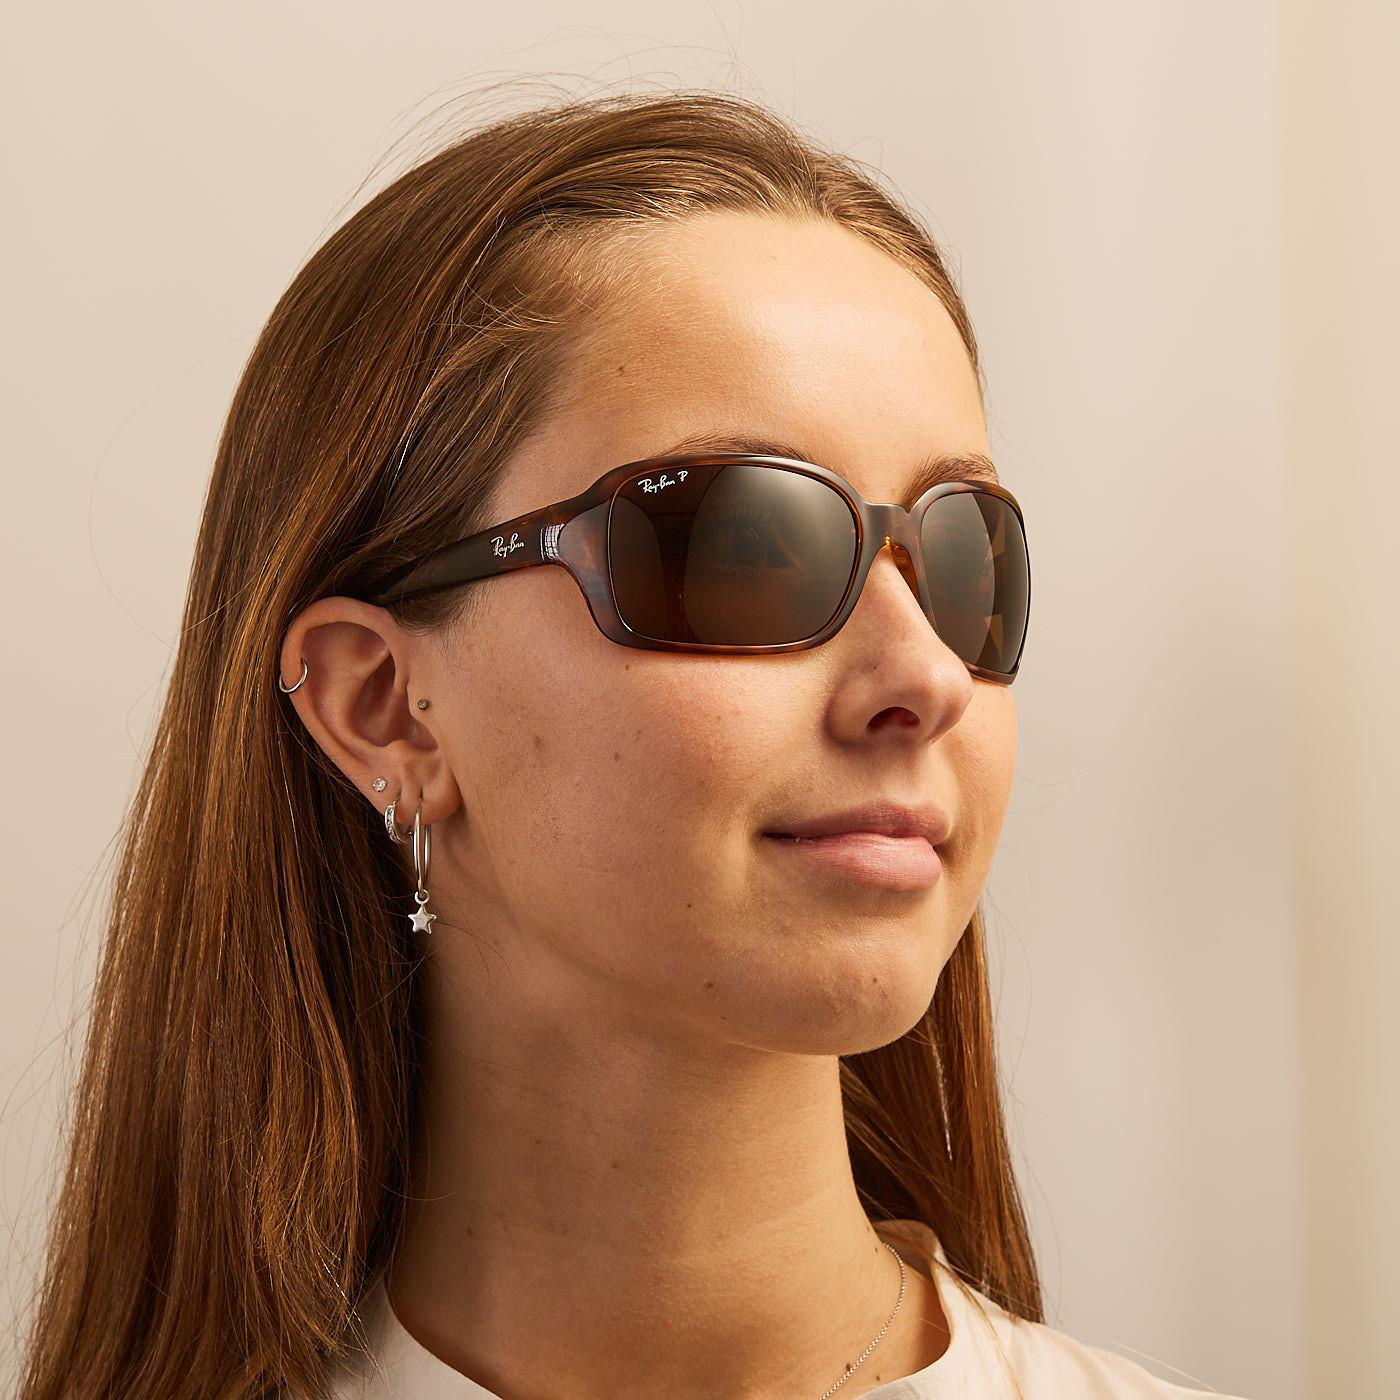 be9de401c6 Ray-Ban Sunglasses RB40686425760 - Sunglasses